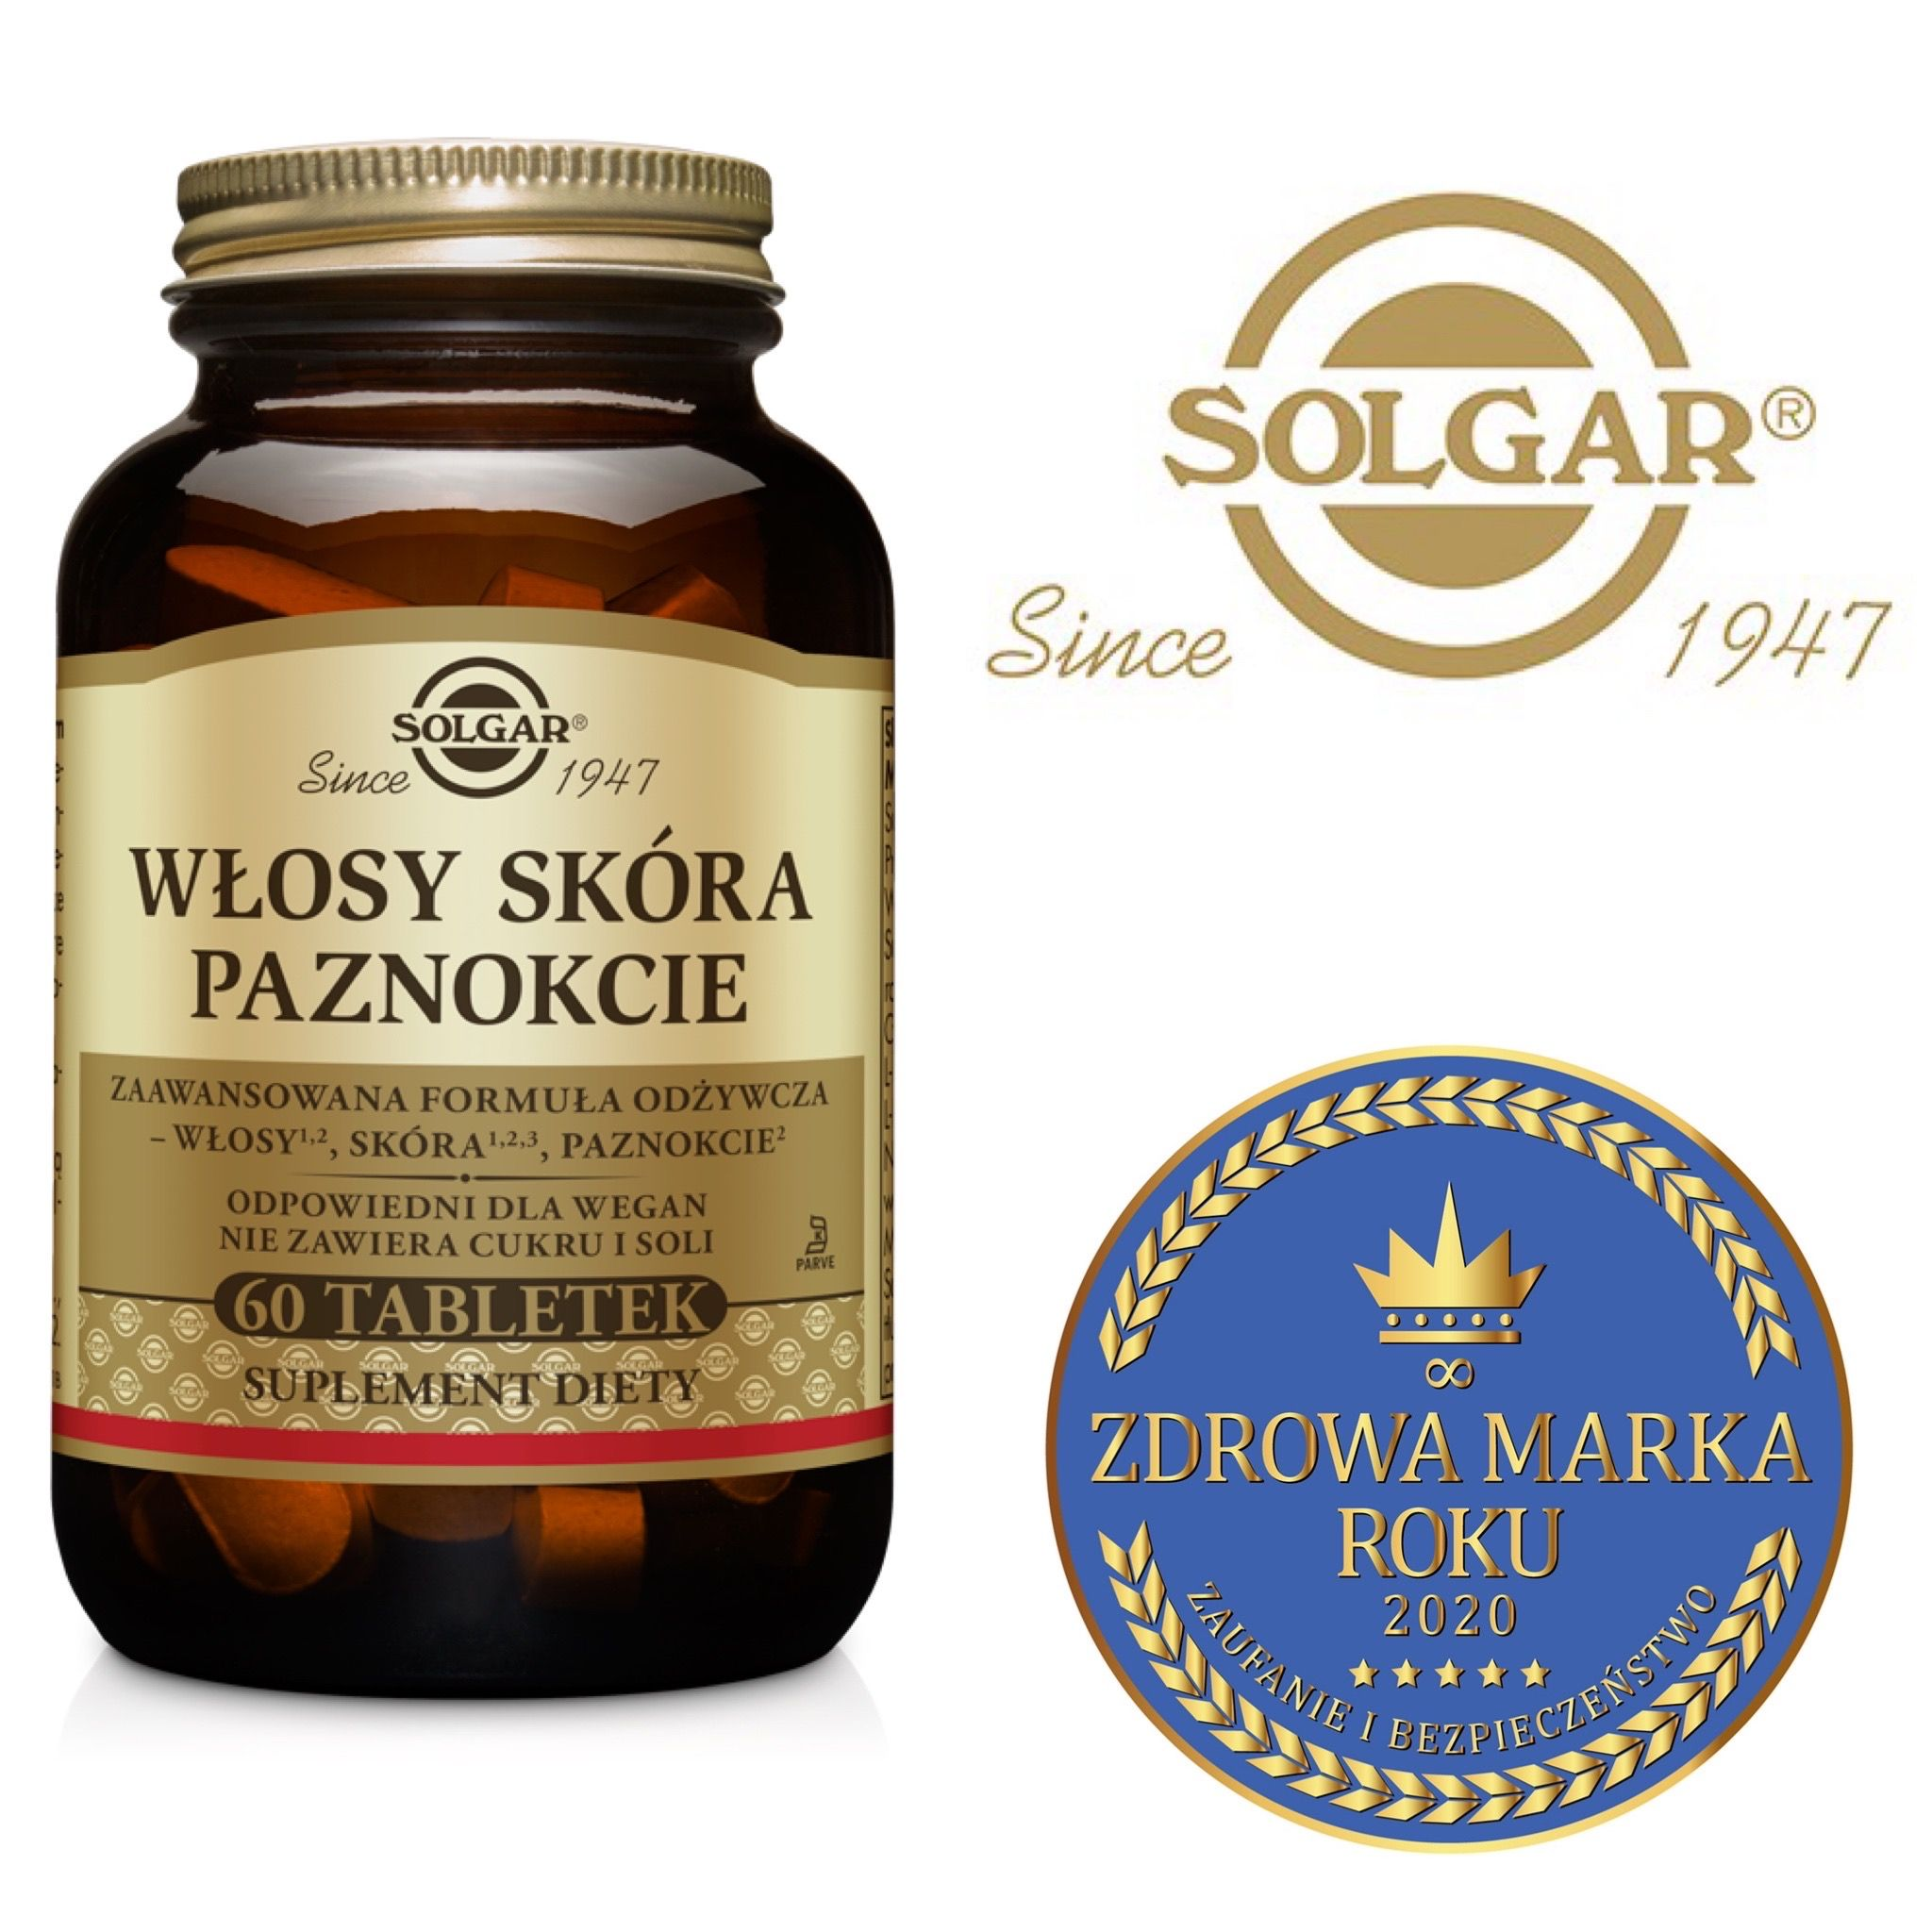 Suplementy diety prosto z natury w butelce ze zotym kapslem Solgar